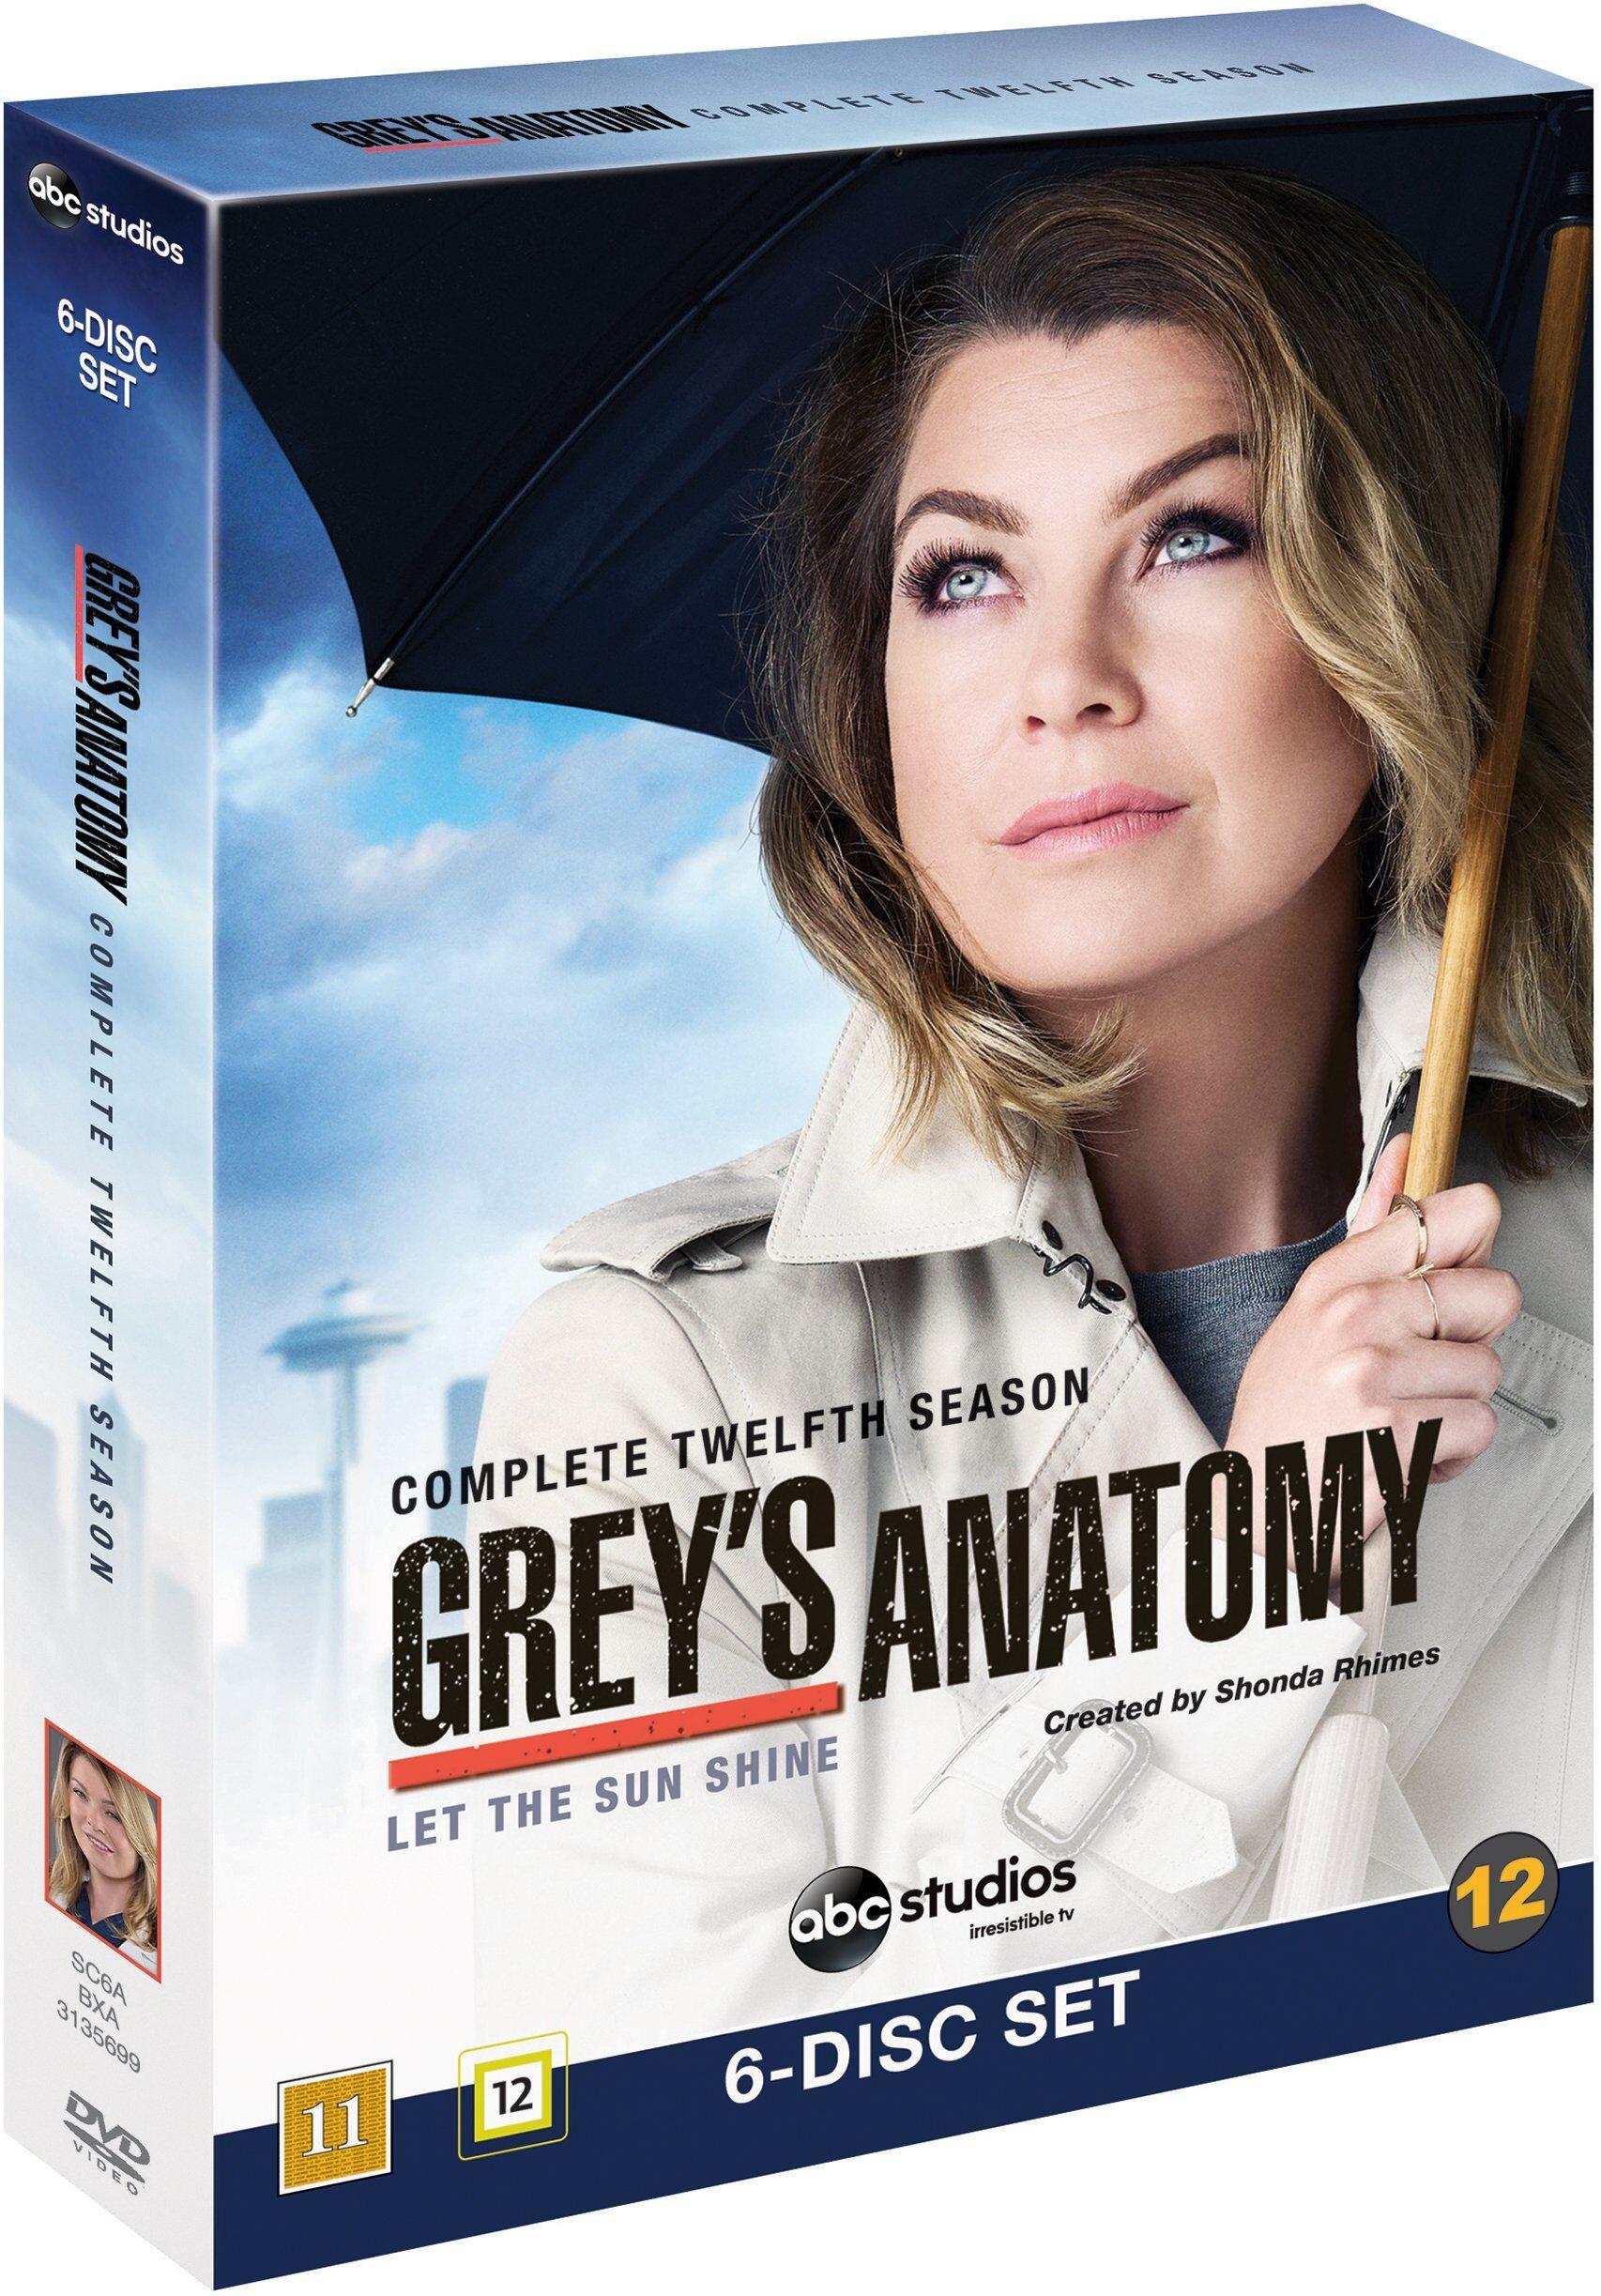 Greys anatomy/Greys hvide verden season 12 DVD